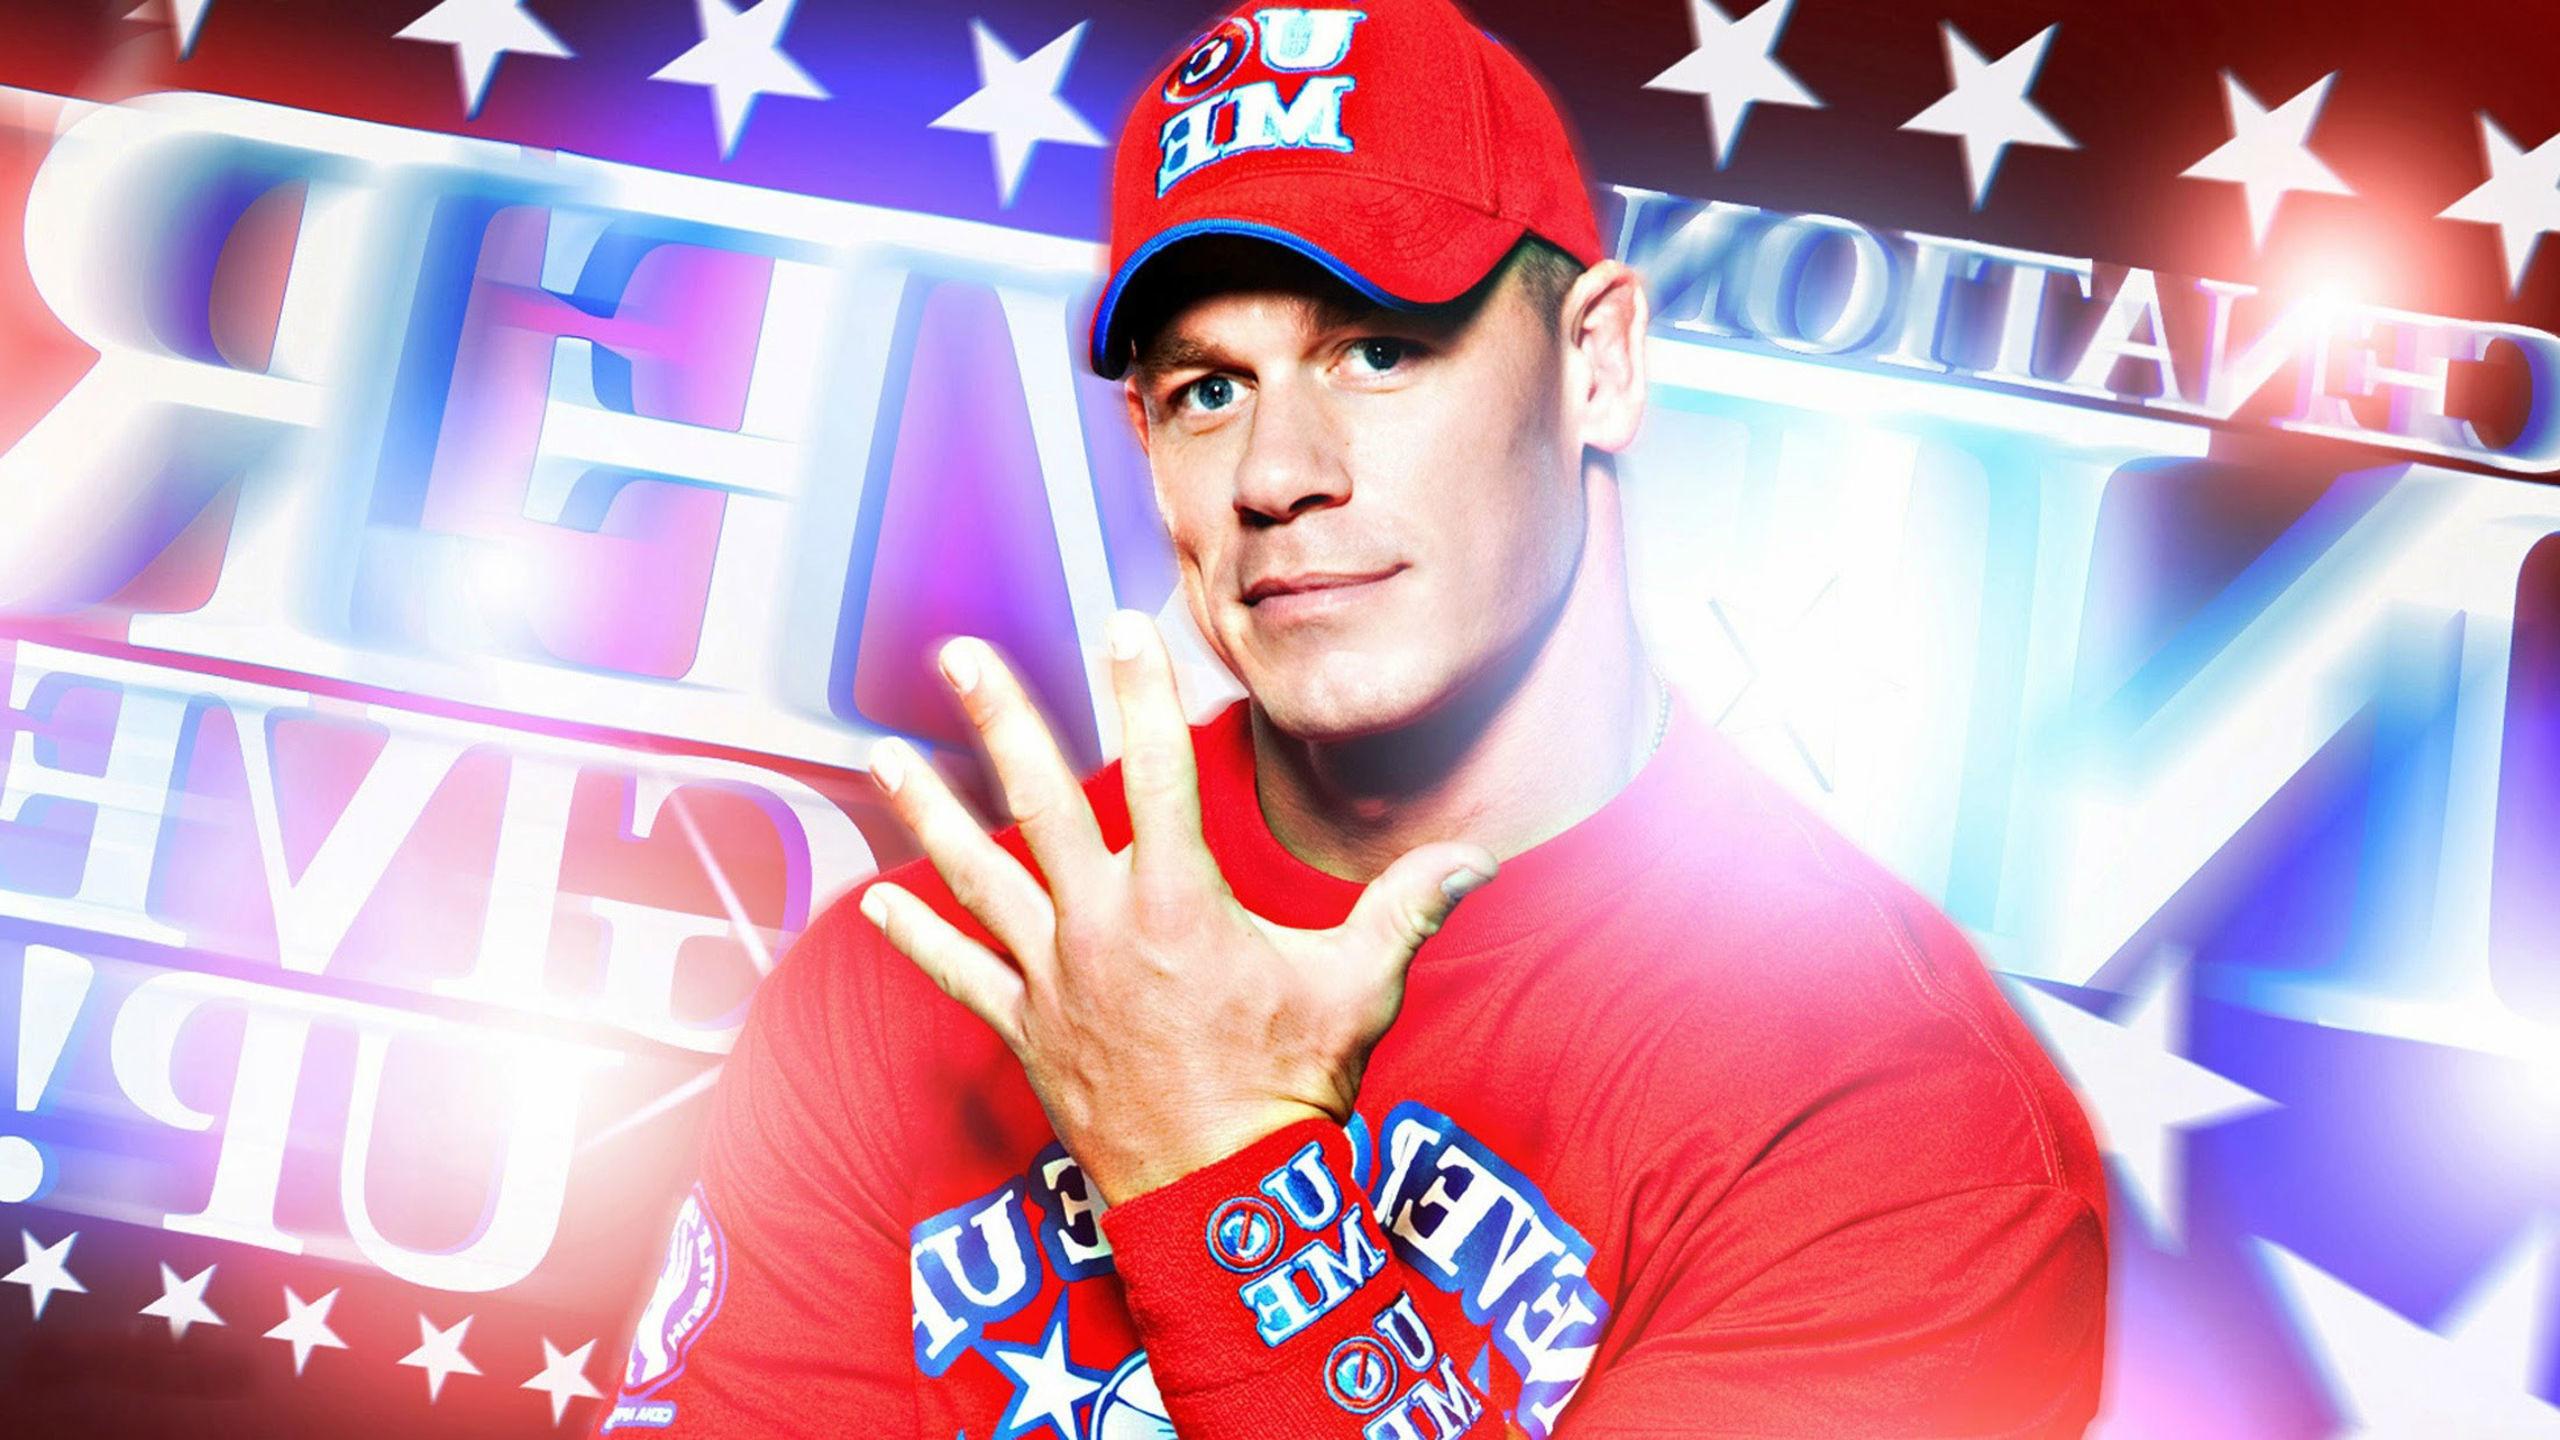 John Cena HD desktop wallpaper : High Definition : Mobile